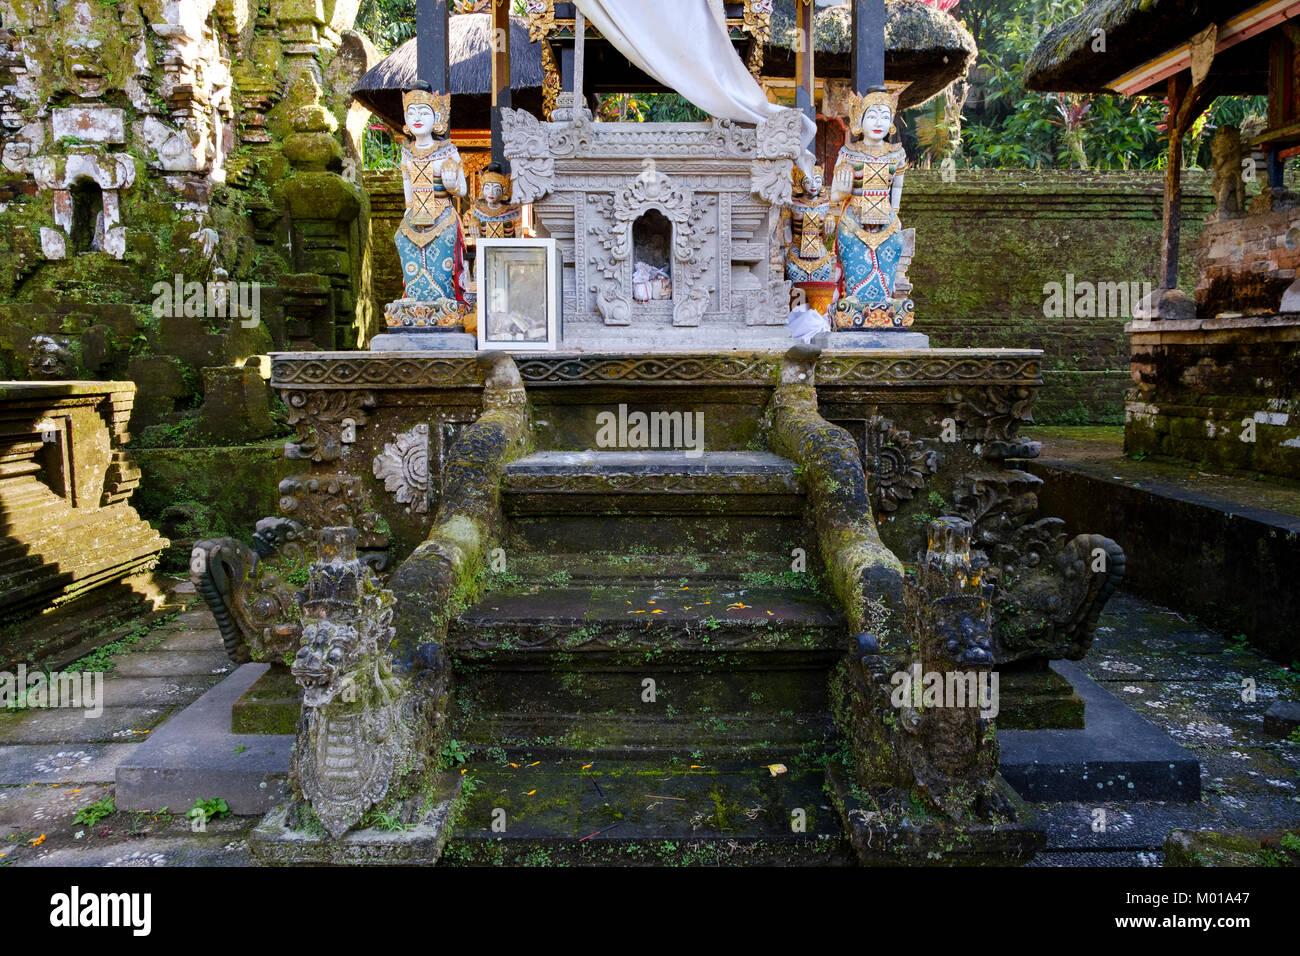 Altar at Pura Gunung Kawi Sebatu, a temple in Bali, Indonesia. - Stock Image